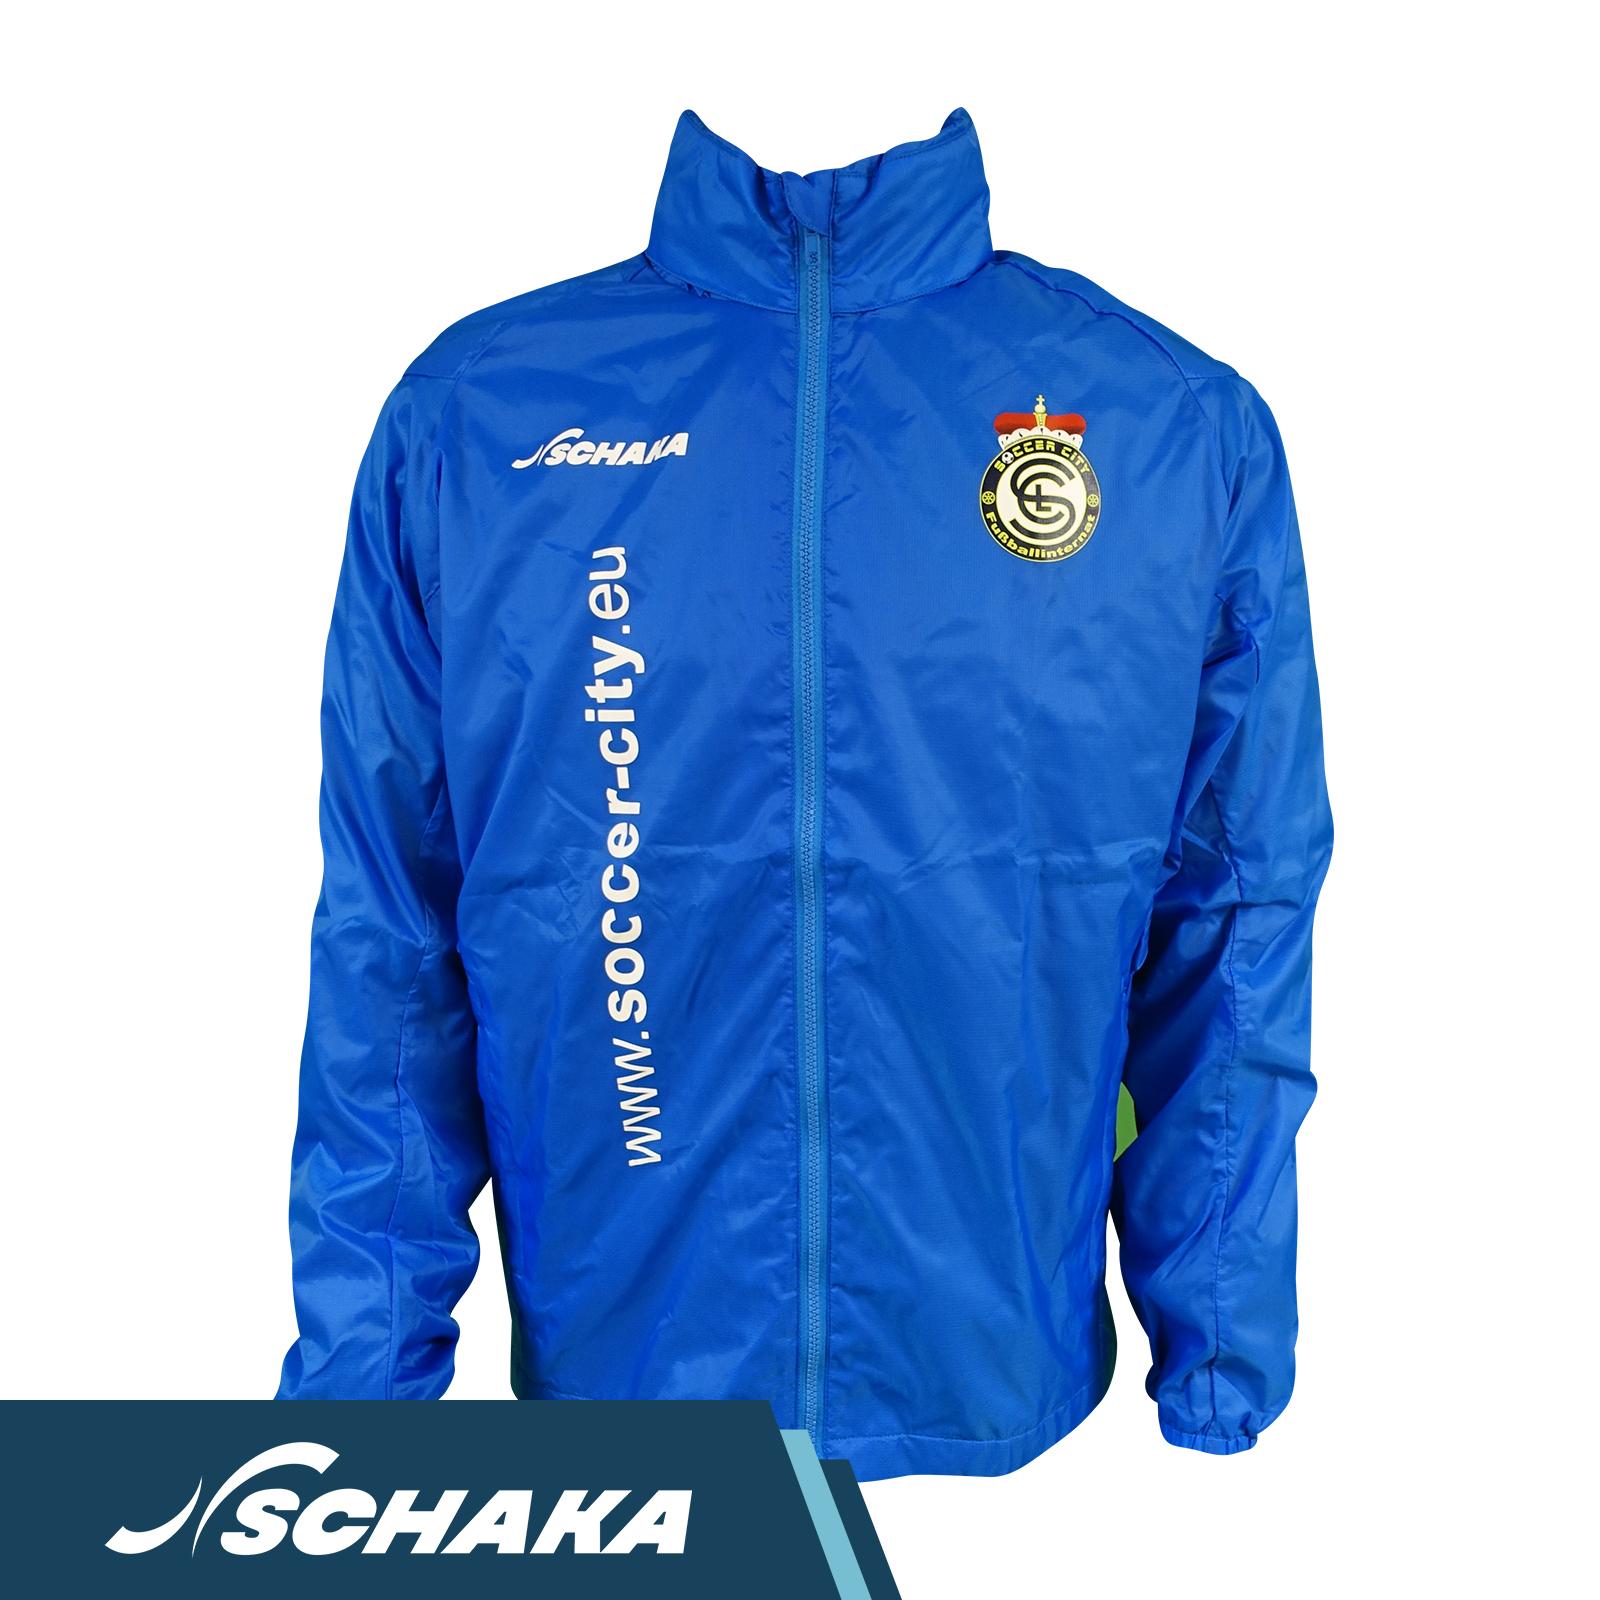 Schaka Rain Jacket MUA Soccer City Edition